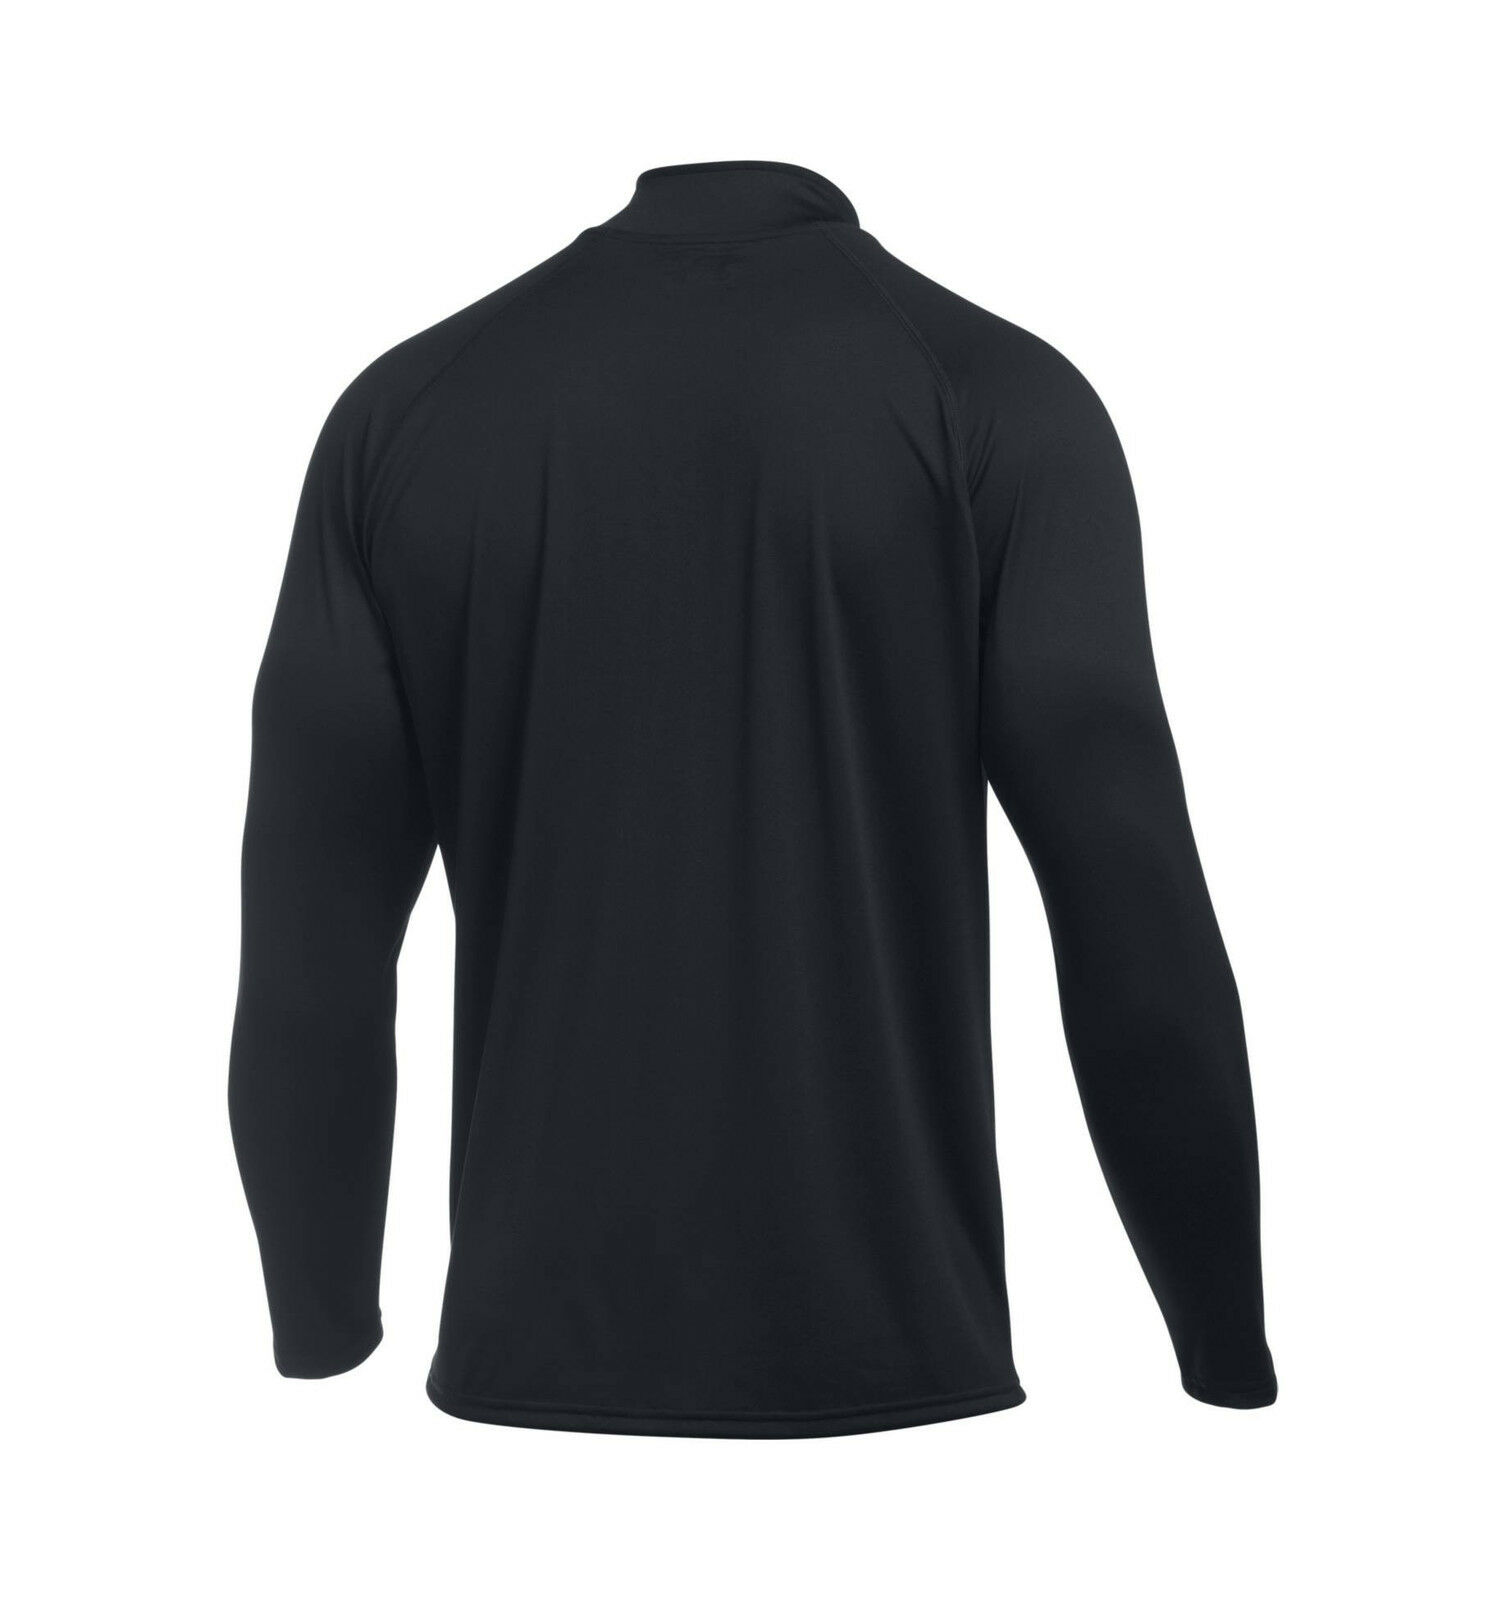 Under Armour 1285765 UA Tactical Men/'s 1//4 Zip Long Sleeve Shirt Size S-3XL